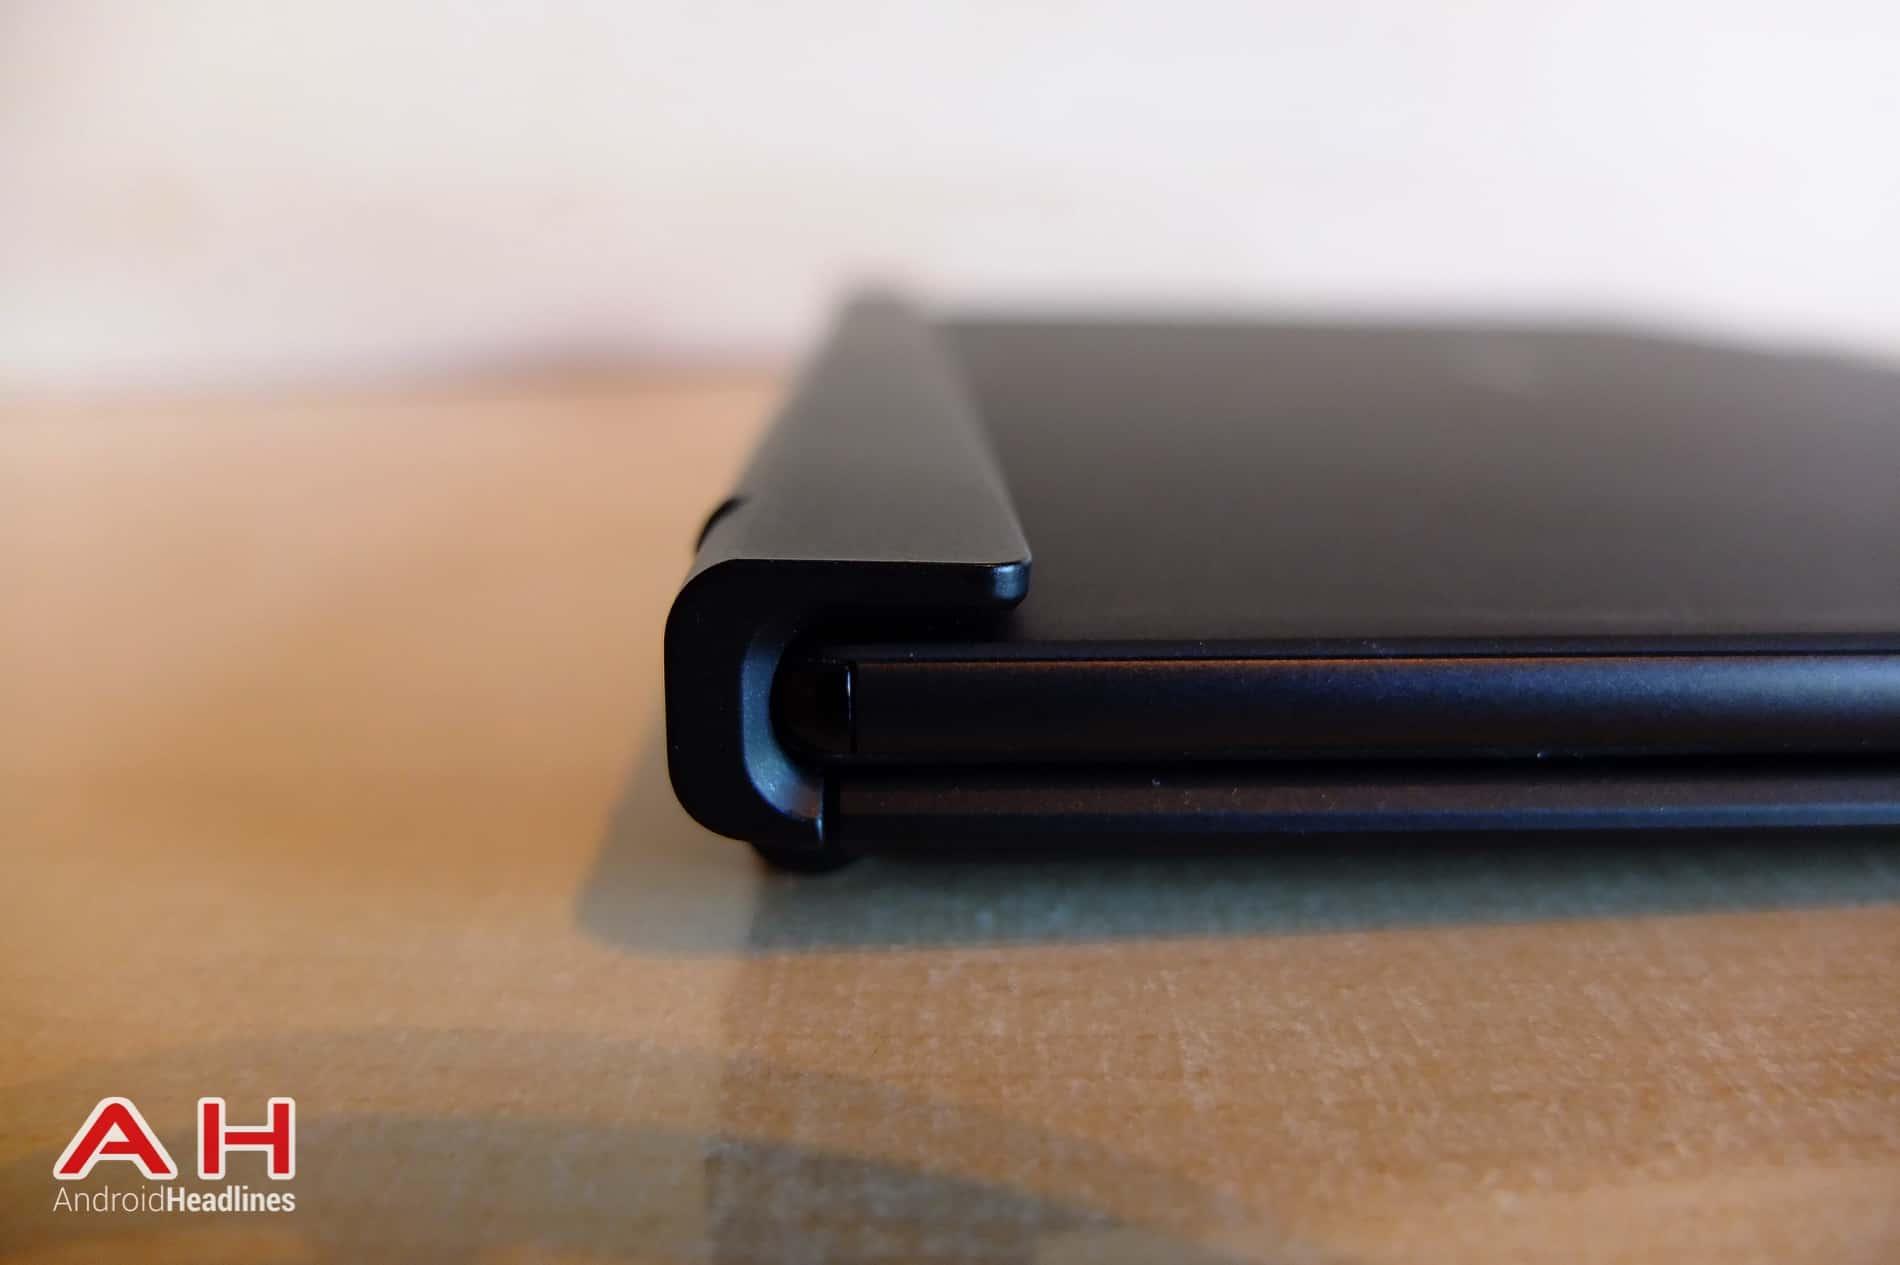 Xperia Z4 Tablet AH 25